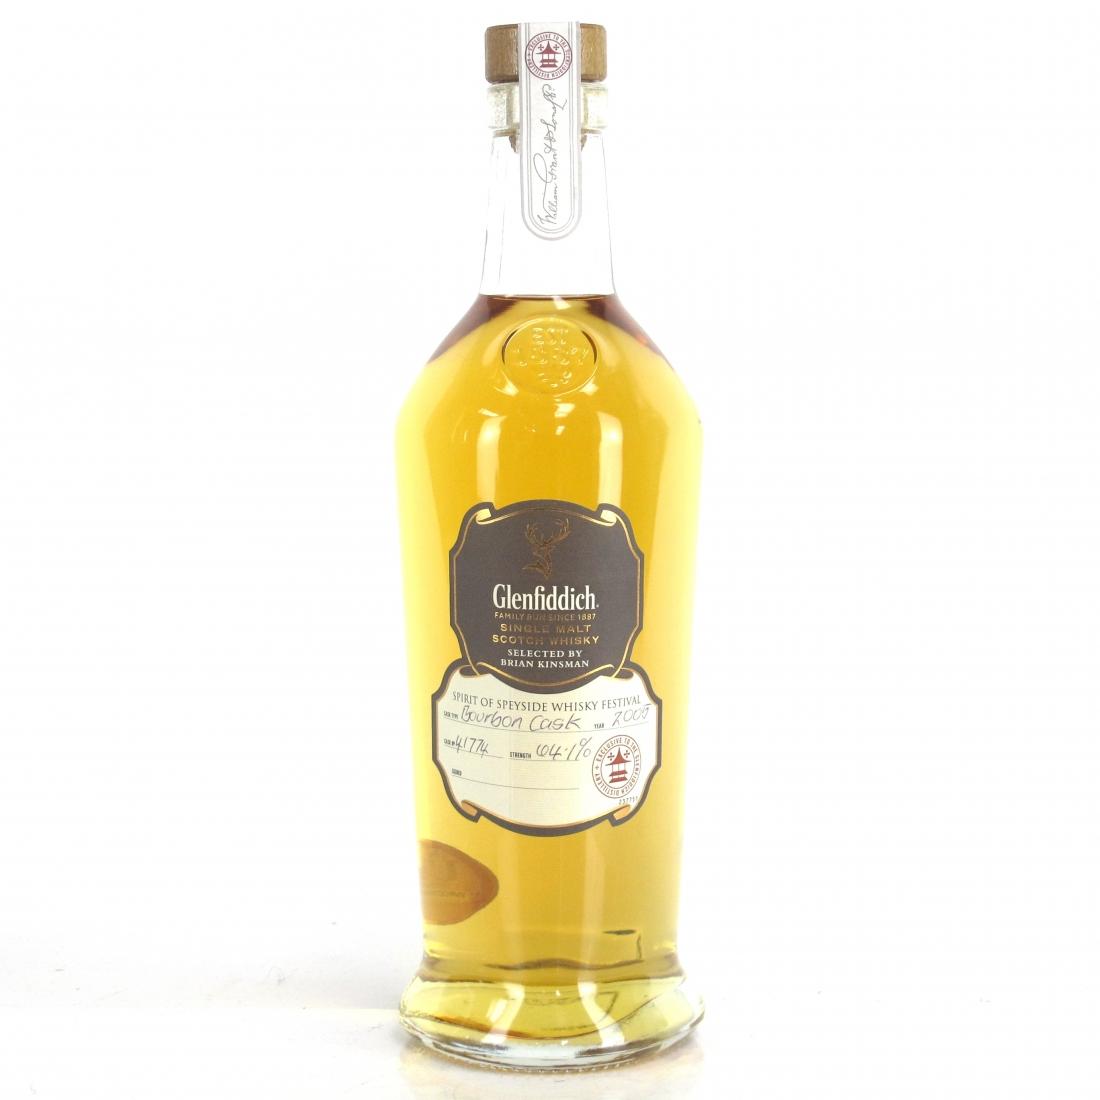 Glenfiddich 2005 Bourbon Cask / Spirit of Speyside 2018